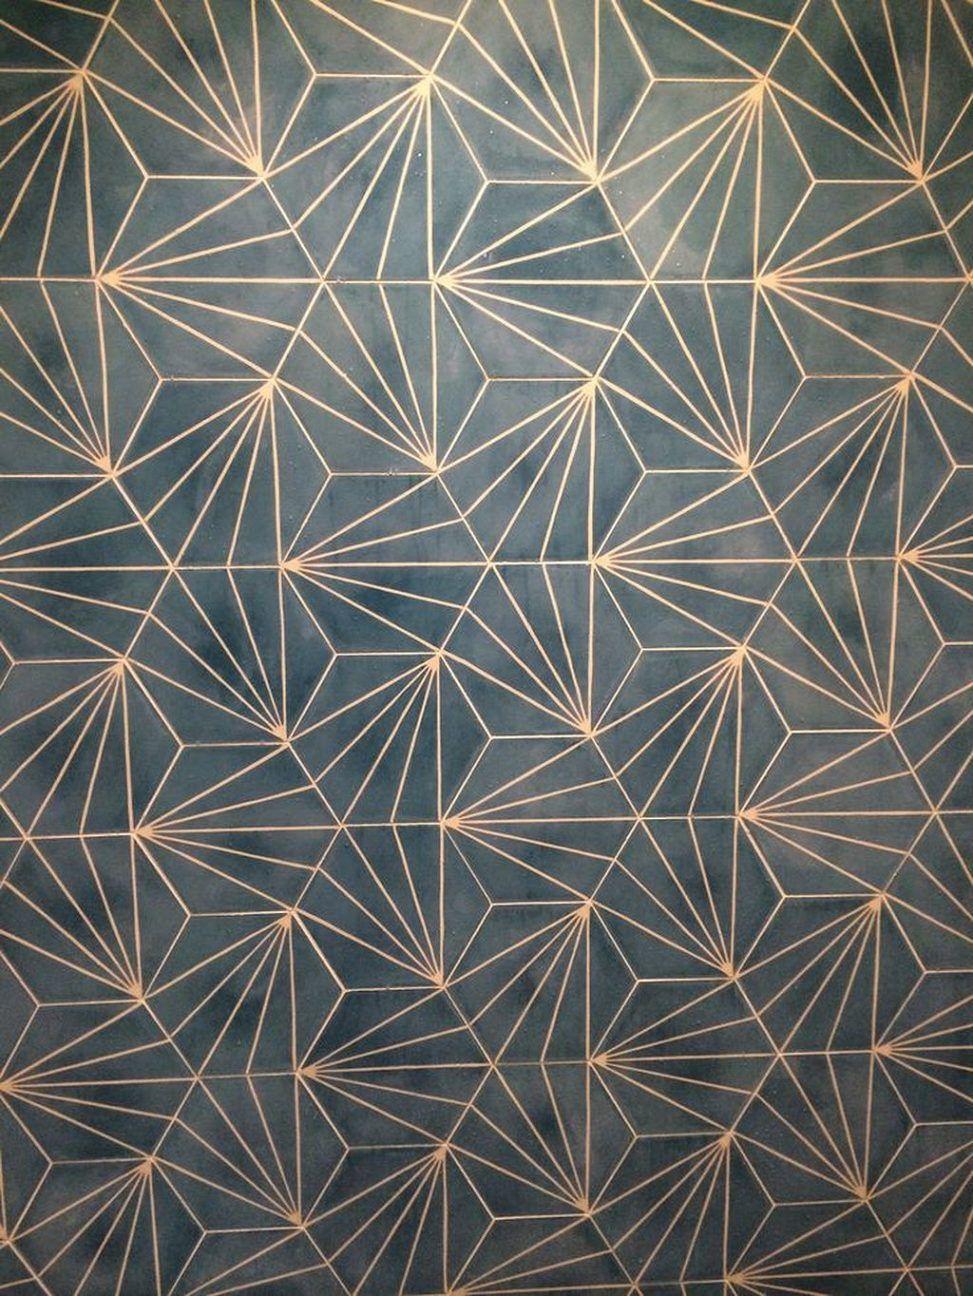 Park Art|My WordPress Blog_Stimsone Hexagon Art Deco Paintable Peel And Stick Wallpaper Panel